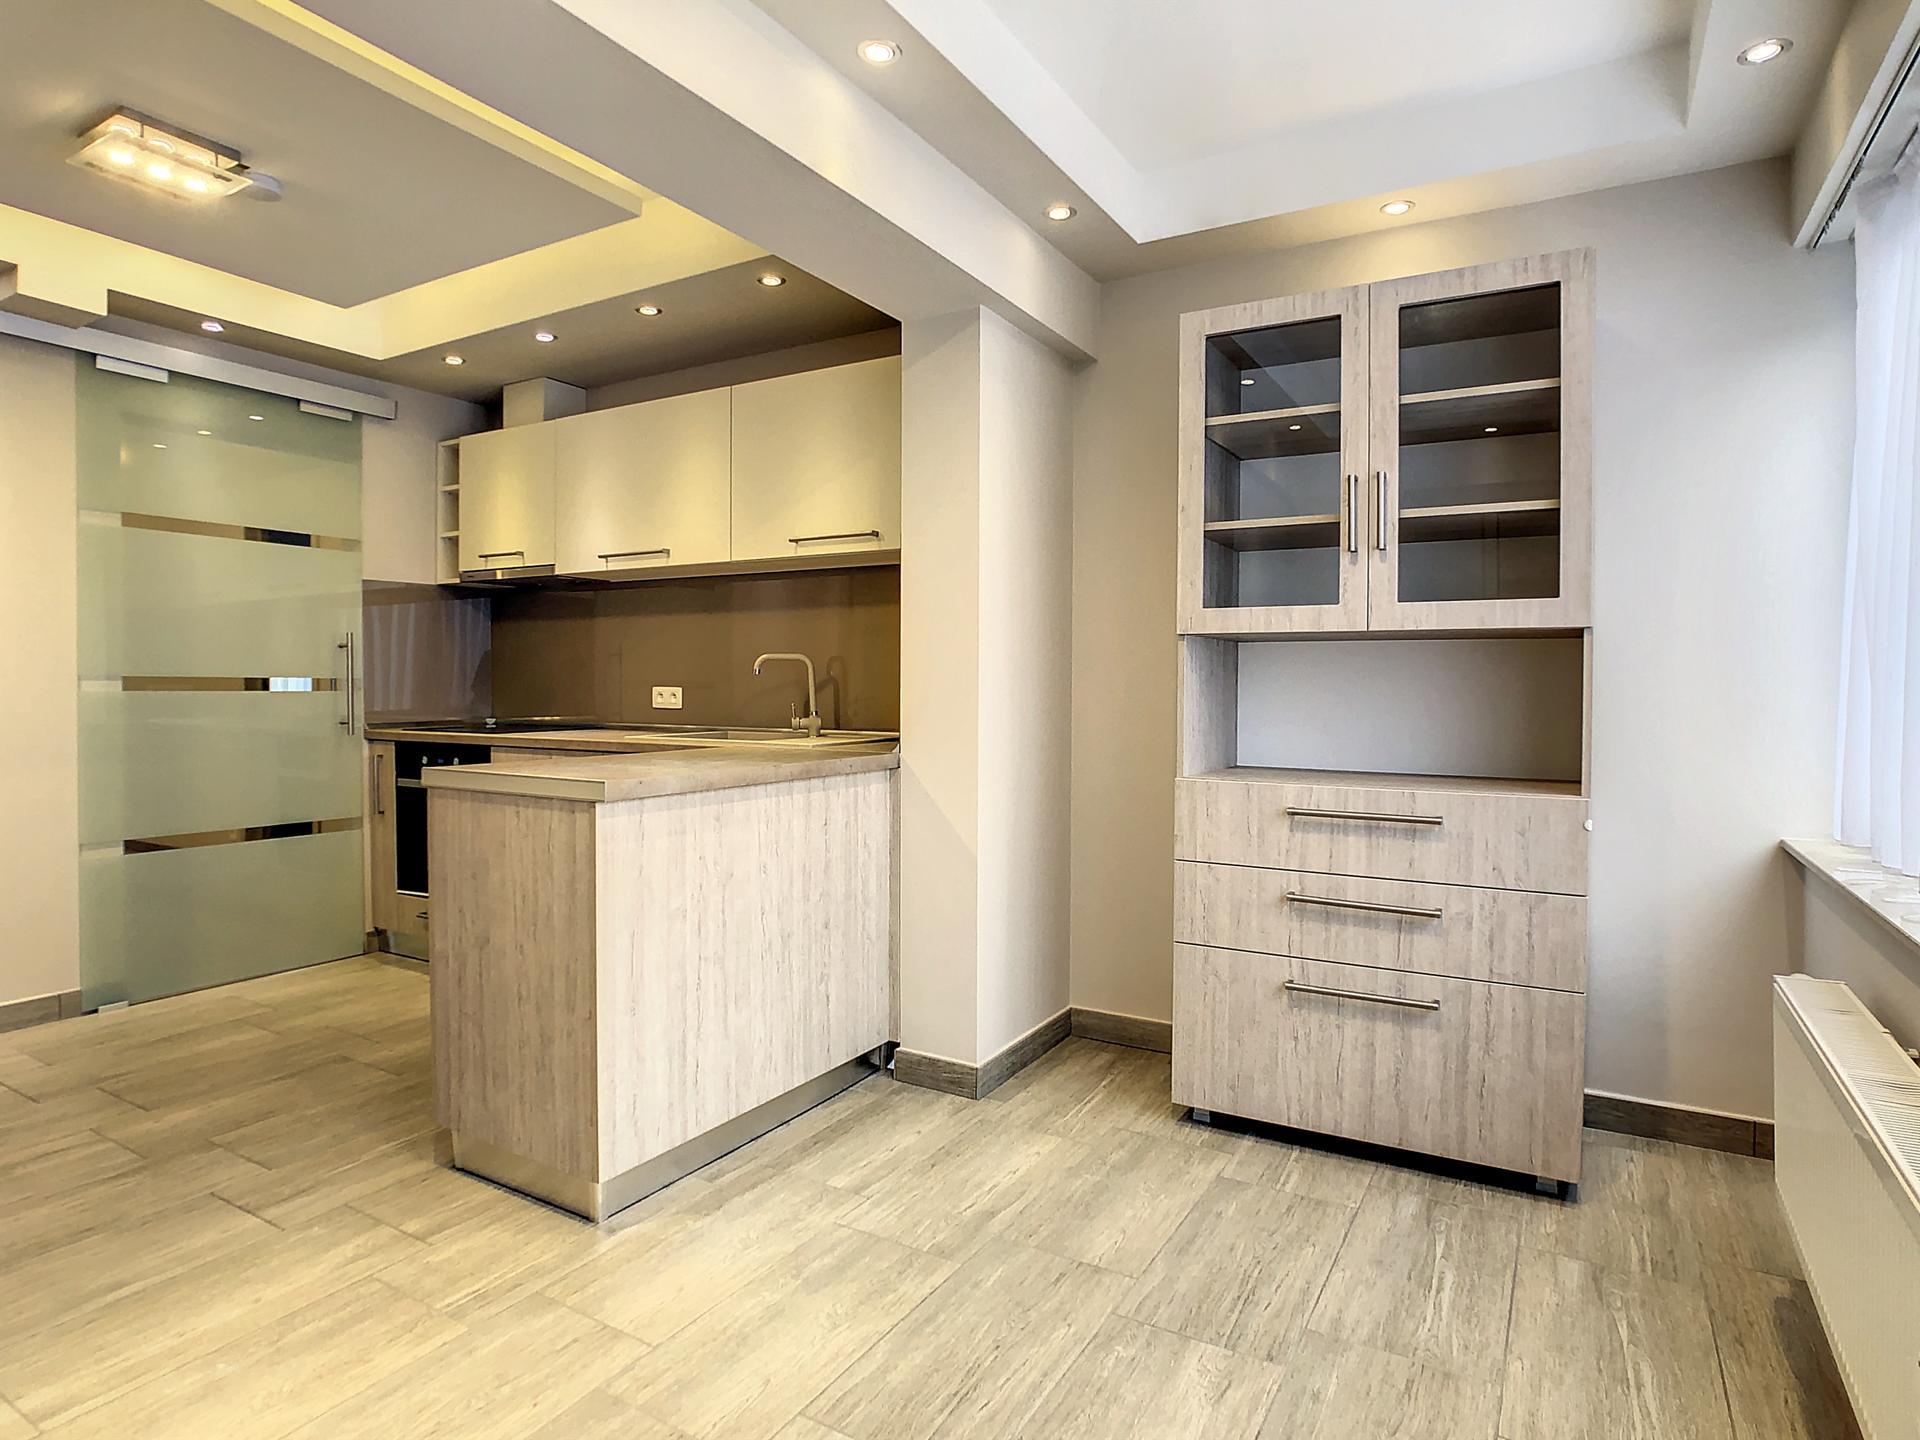 Appartement - Anderlecht - #4519665-1